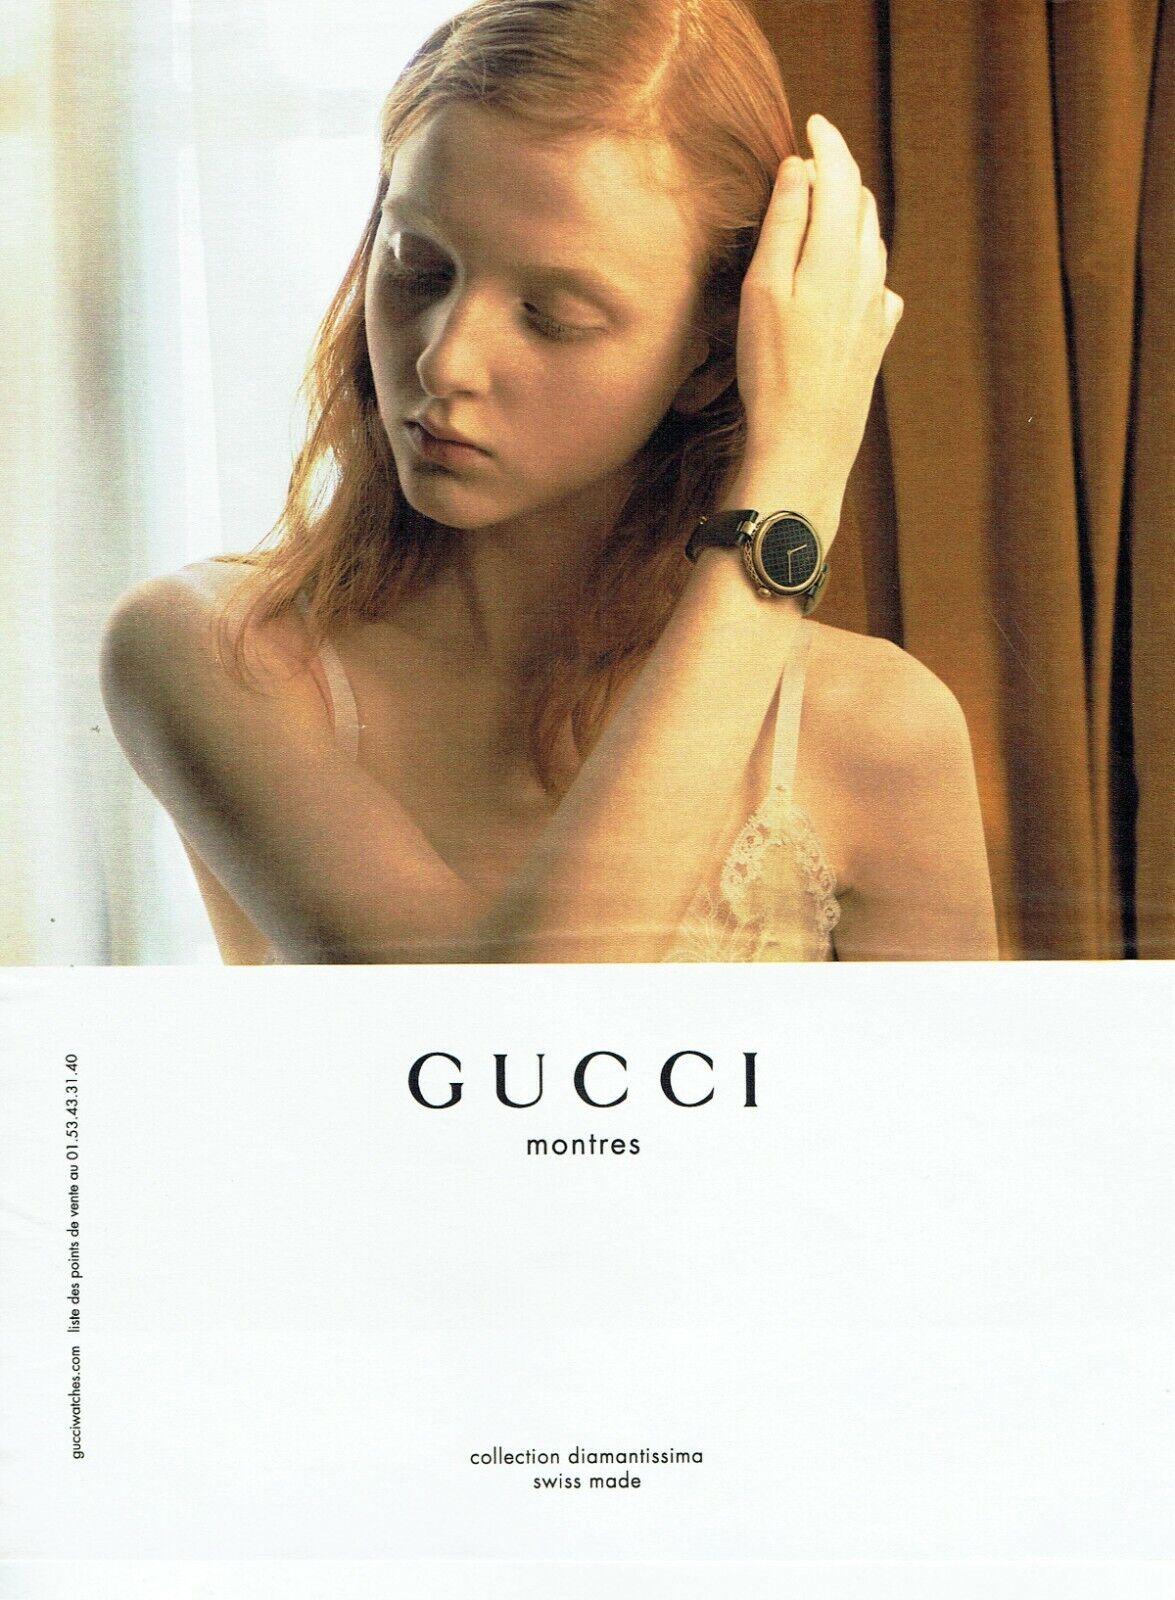 Publicité advertising 1019  2015   gucci montre coll diamantissima